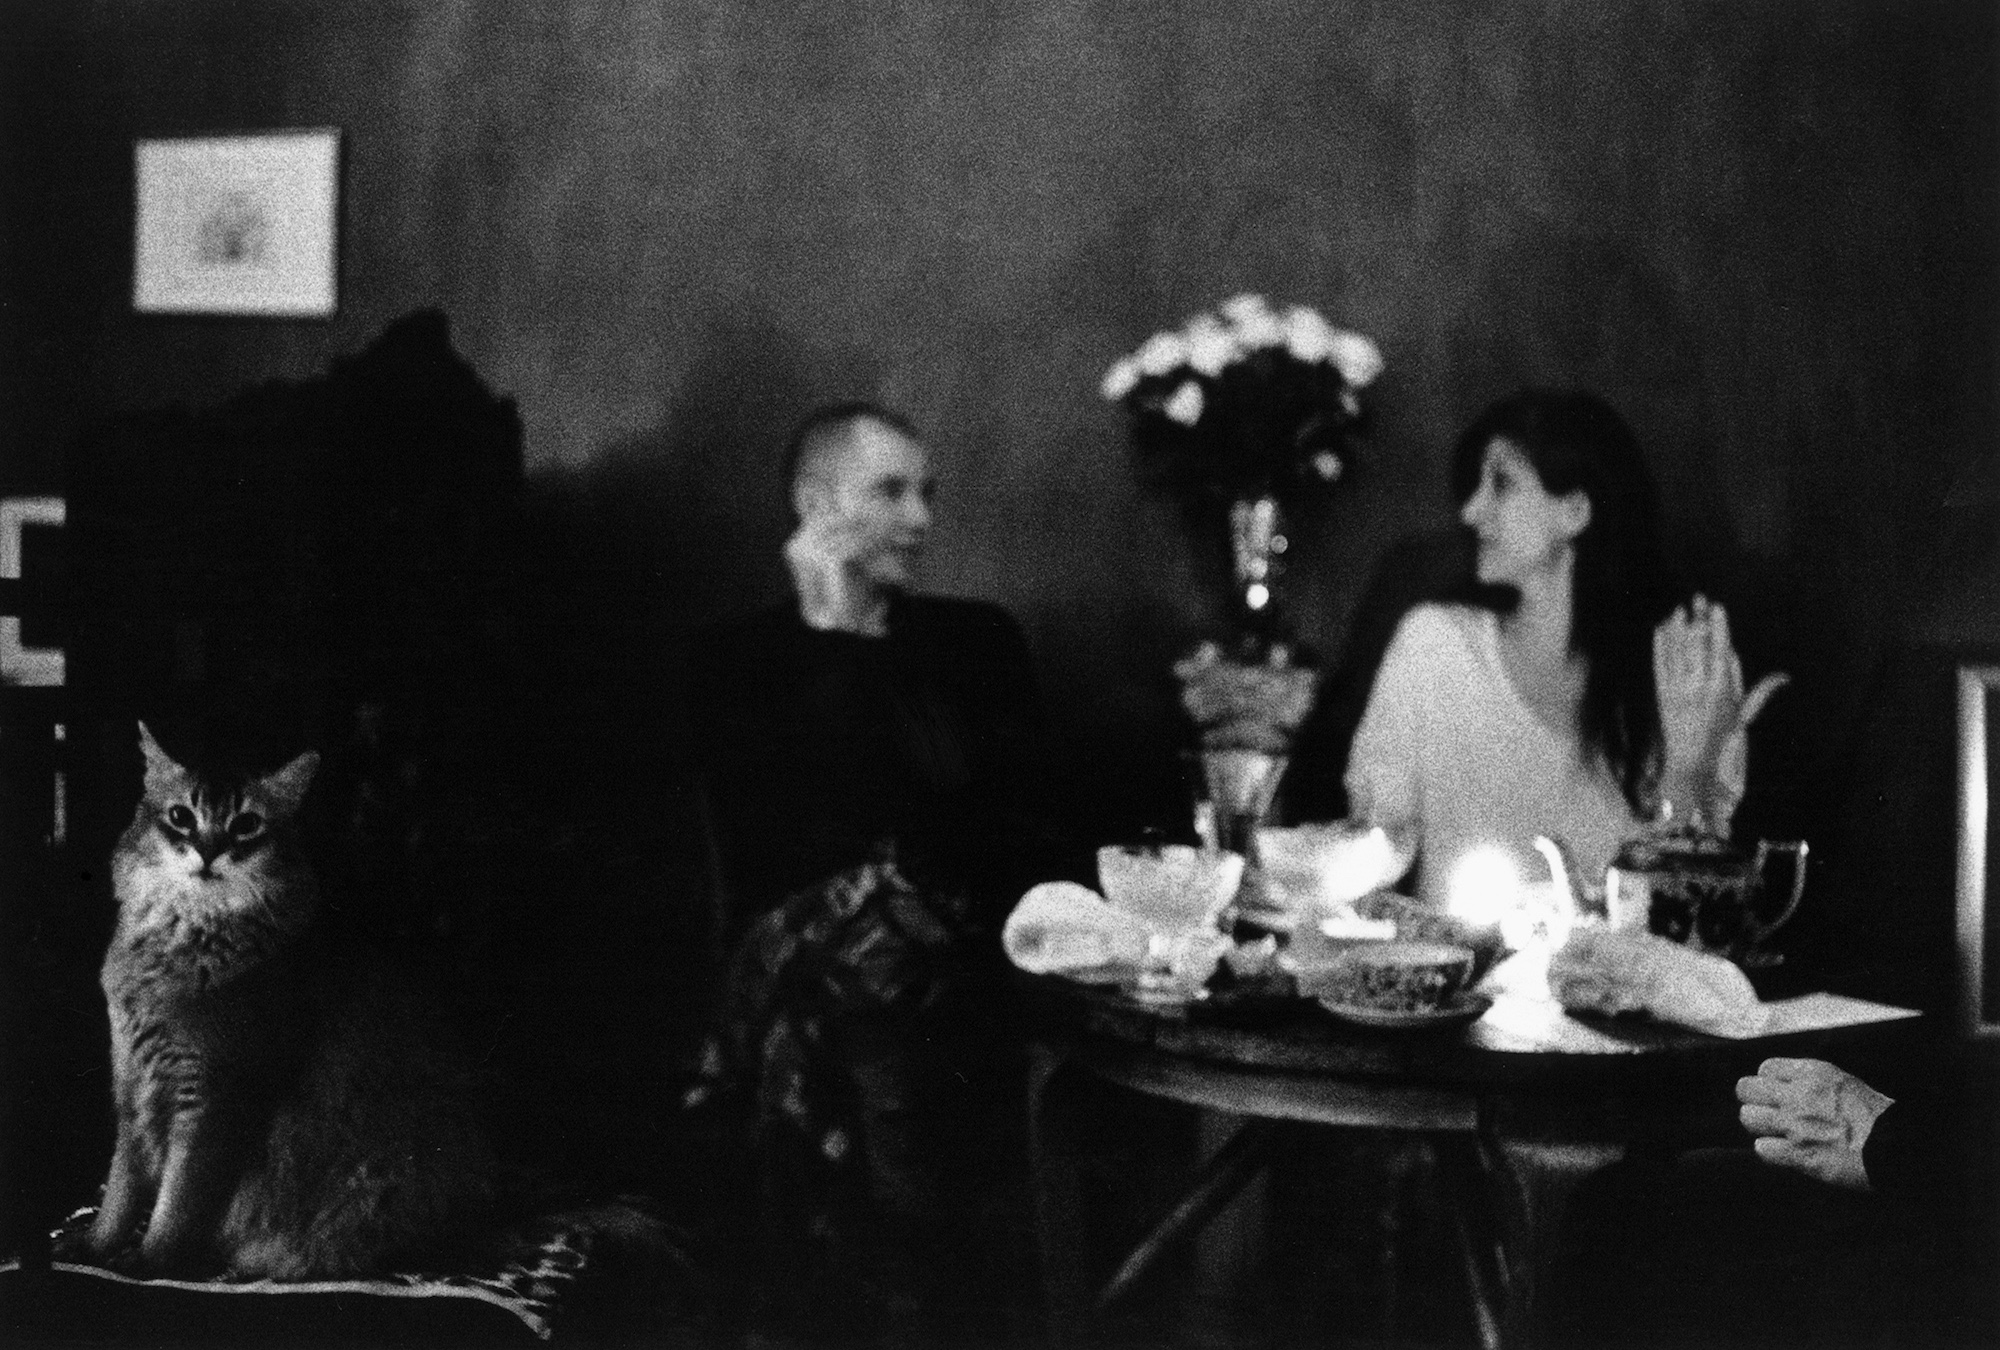 Achilles, Frank and Linda, New York, 1995